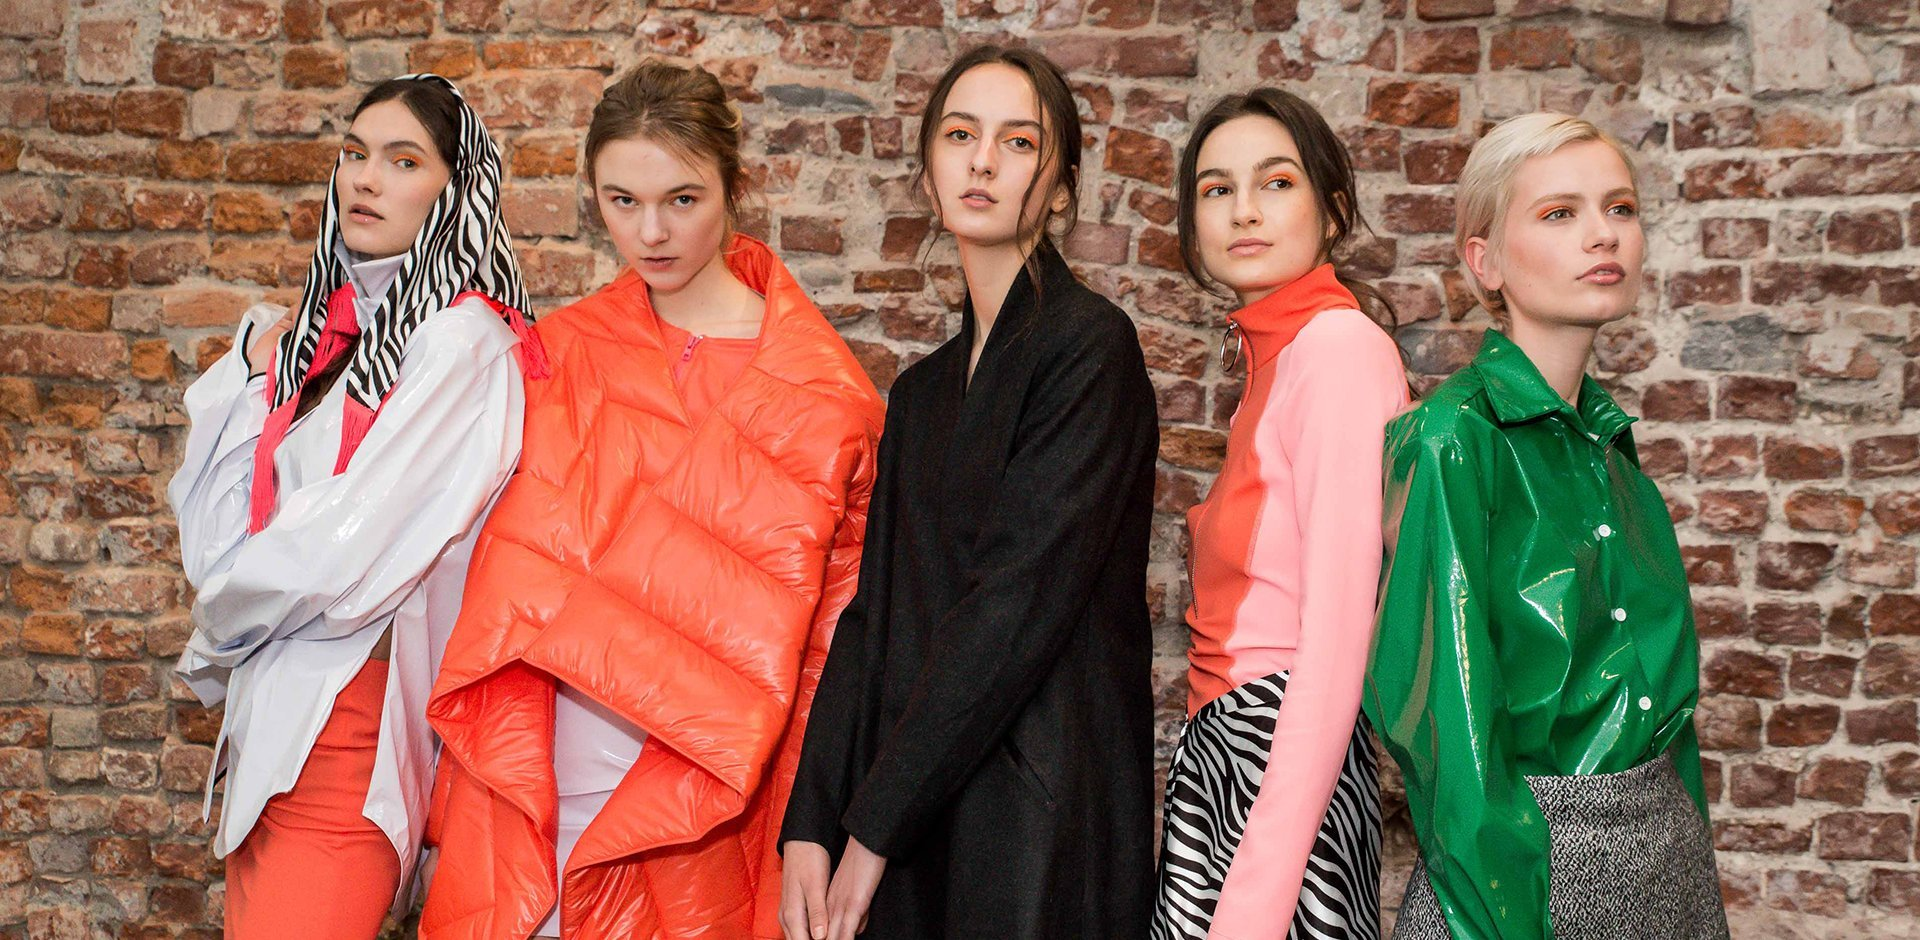 Martina cella, milano fashion week, talent,